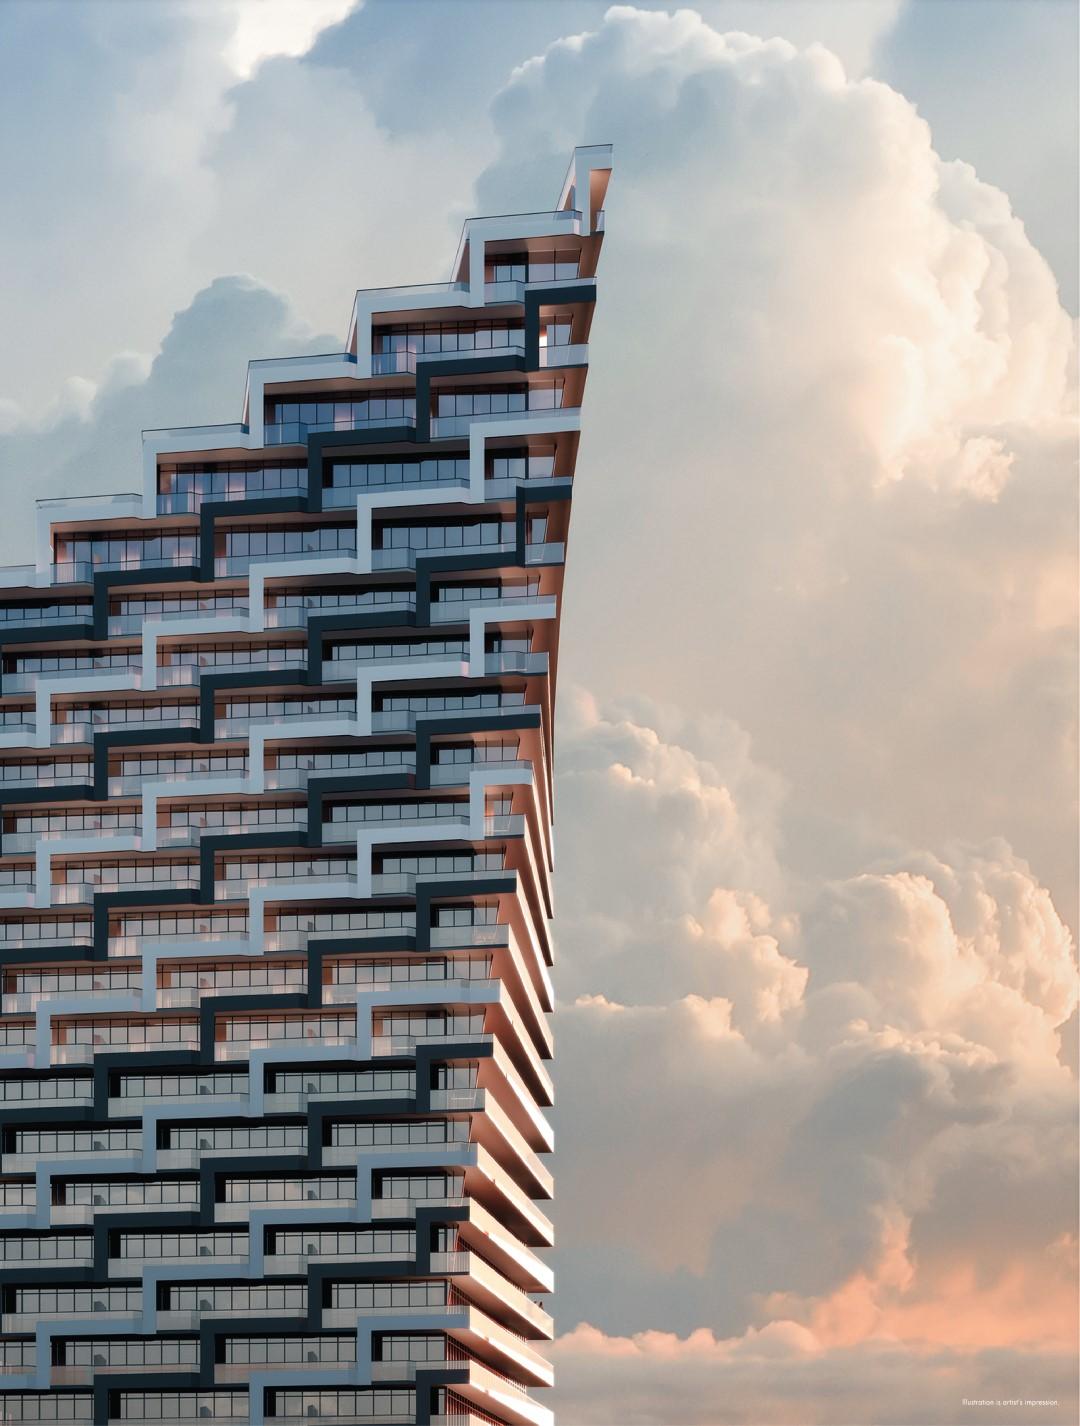 M3 M-city condos rendering of building crown